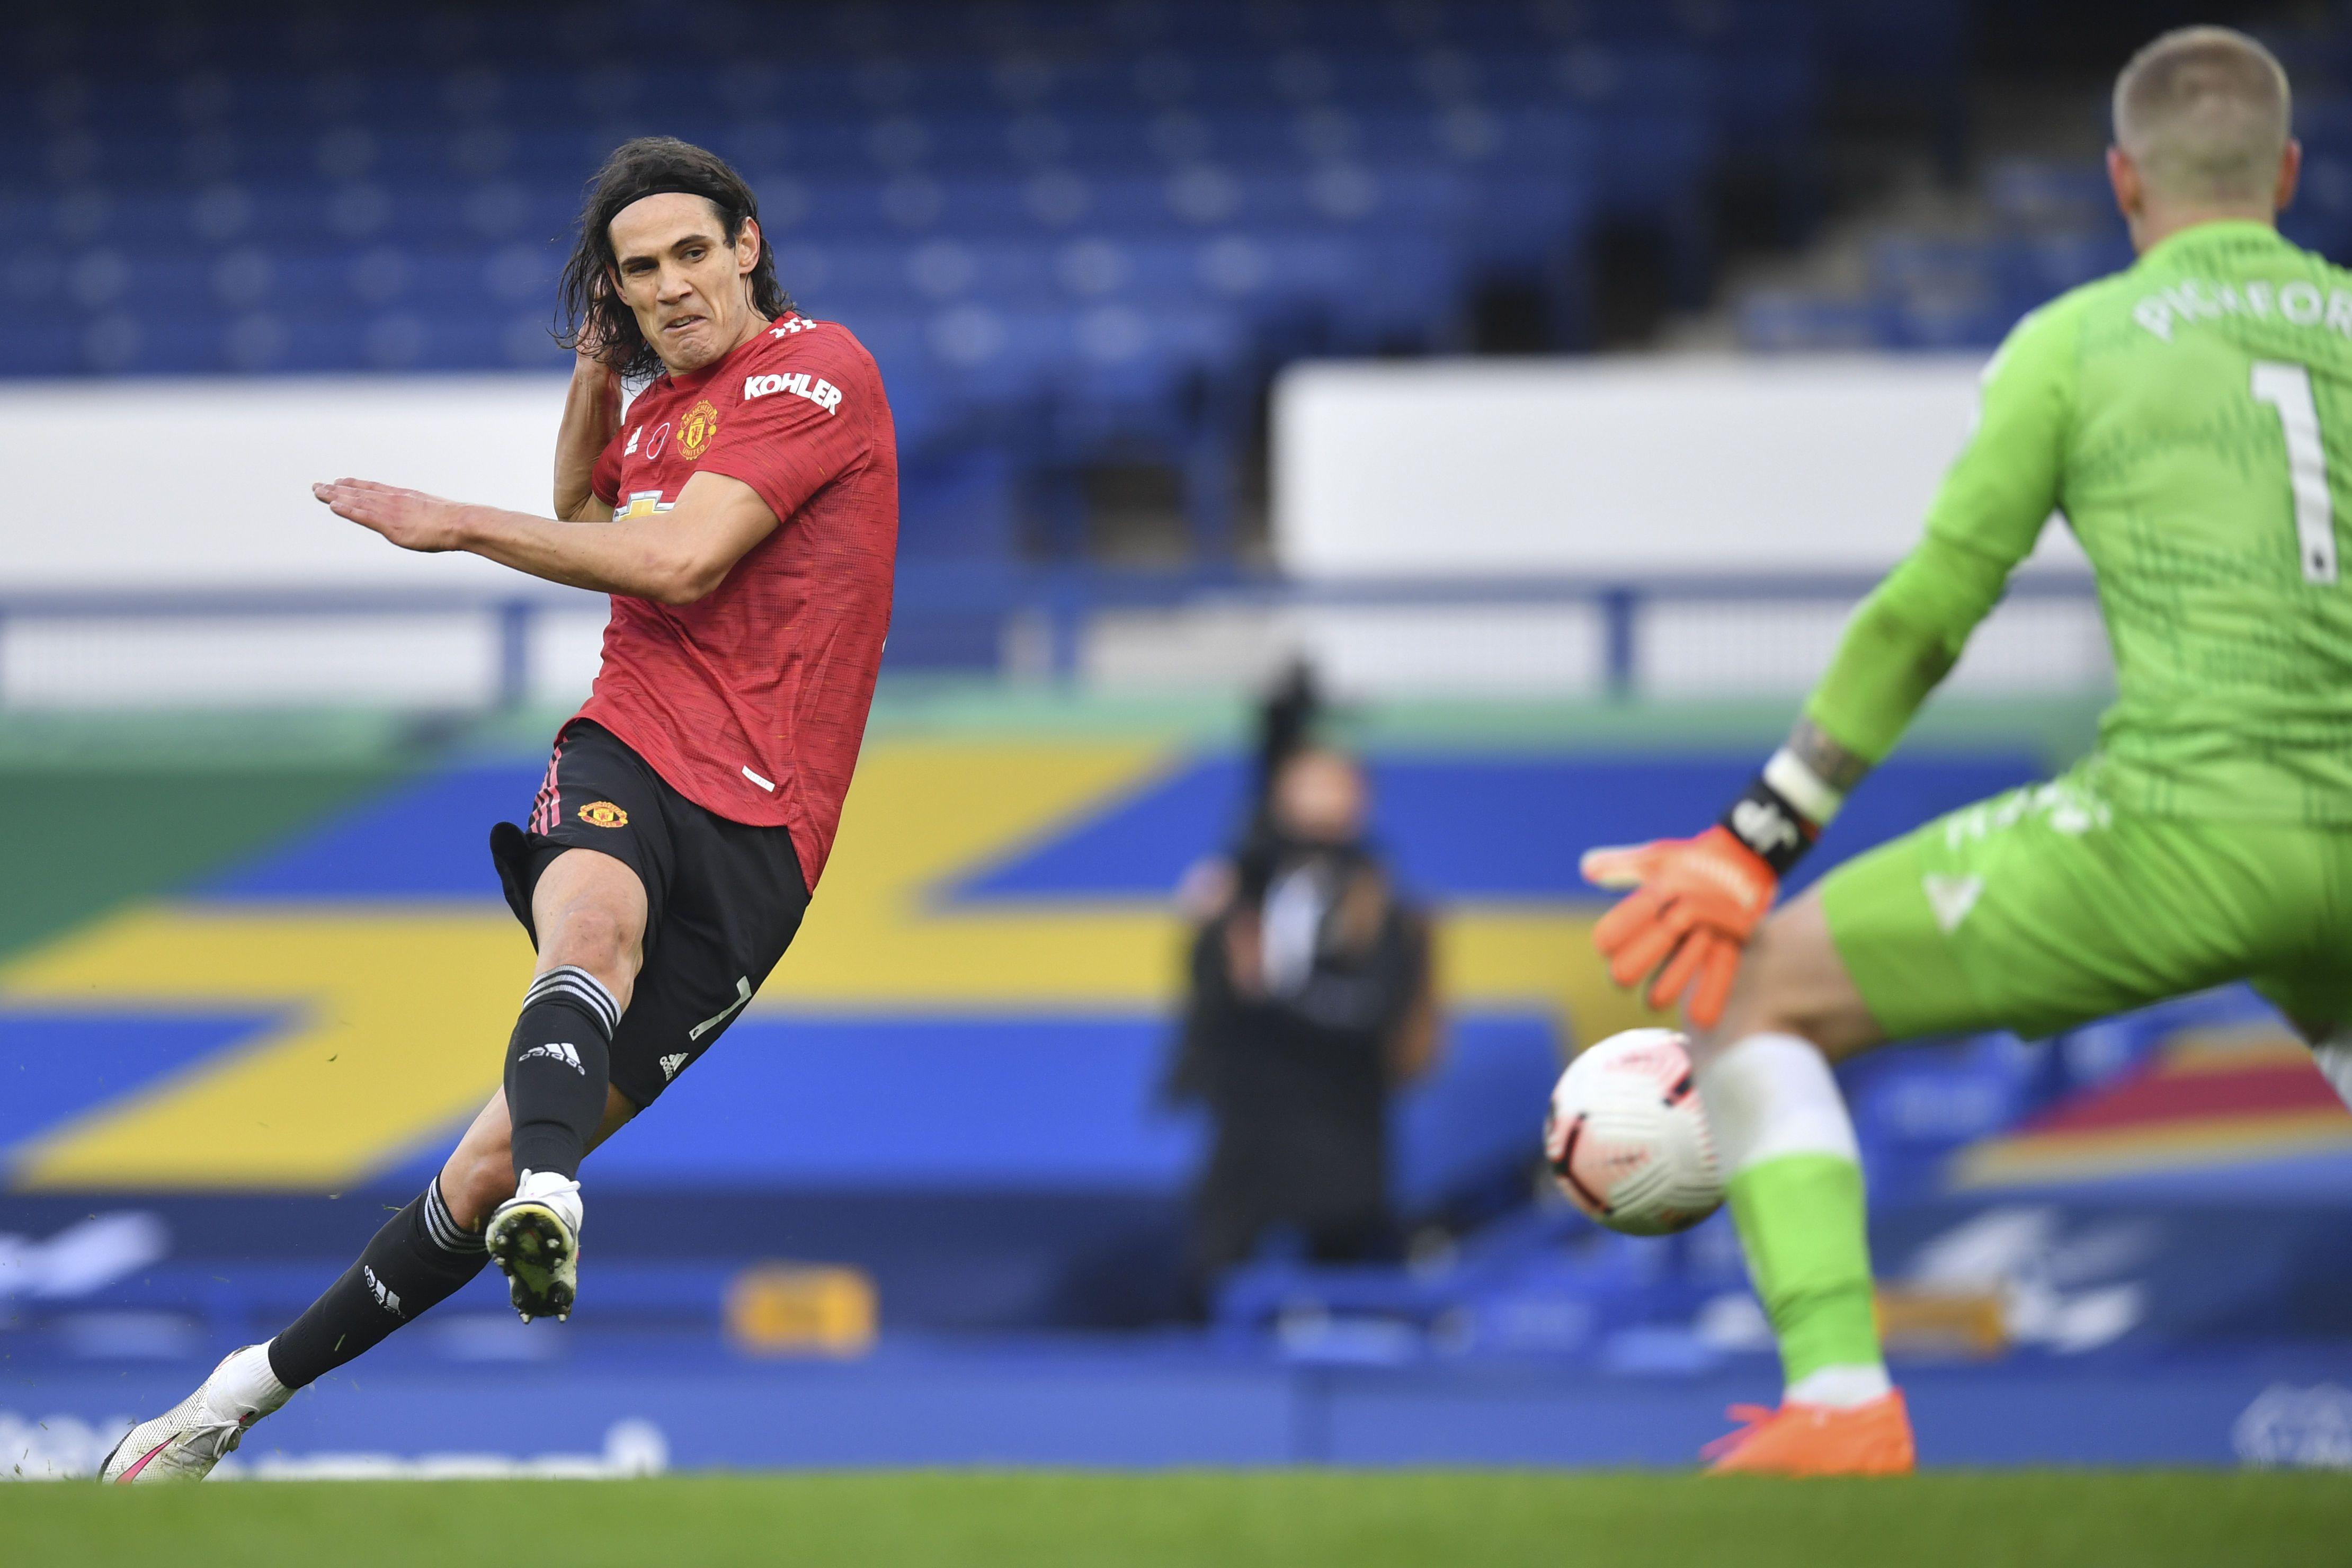 Эвертон - Манчестер Юнайтед результат матча 7.11.2020 ...